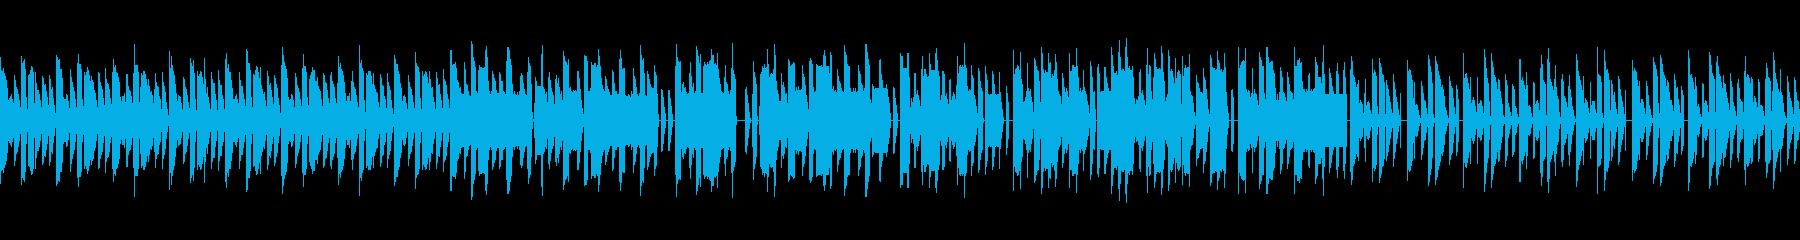 ★8bit ファミコン風 恋愛ゲーム風の再生済みの波形